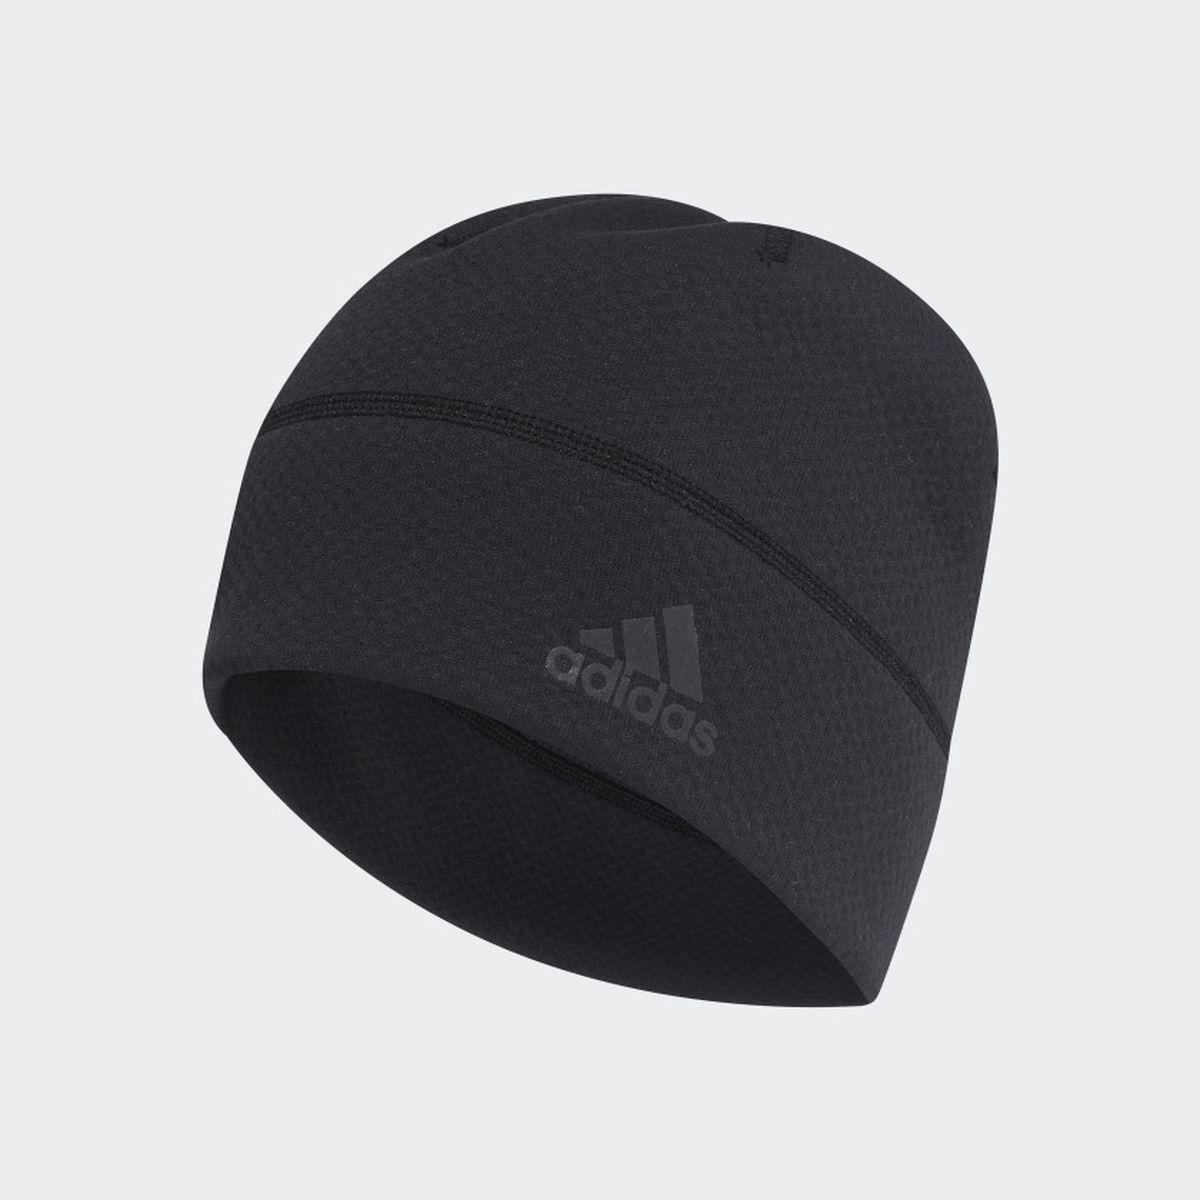 Фото - Шапка adidas Clmht Beanie шапка мужская adidas tiro beanie цвет черный bq1662 размер 58 60